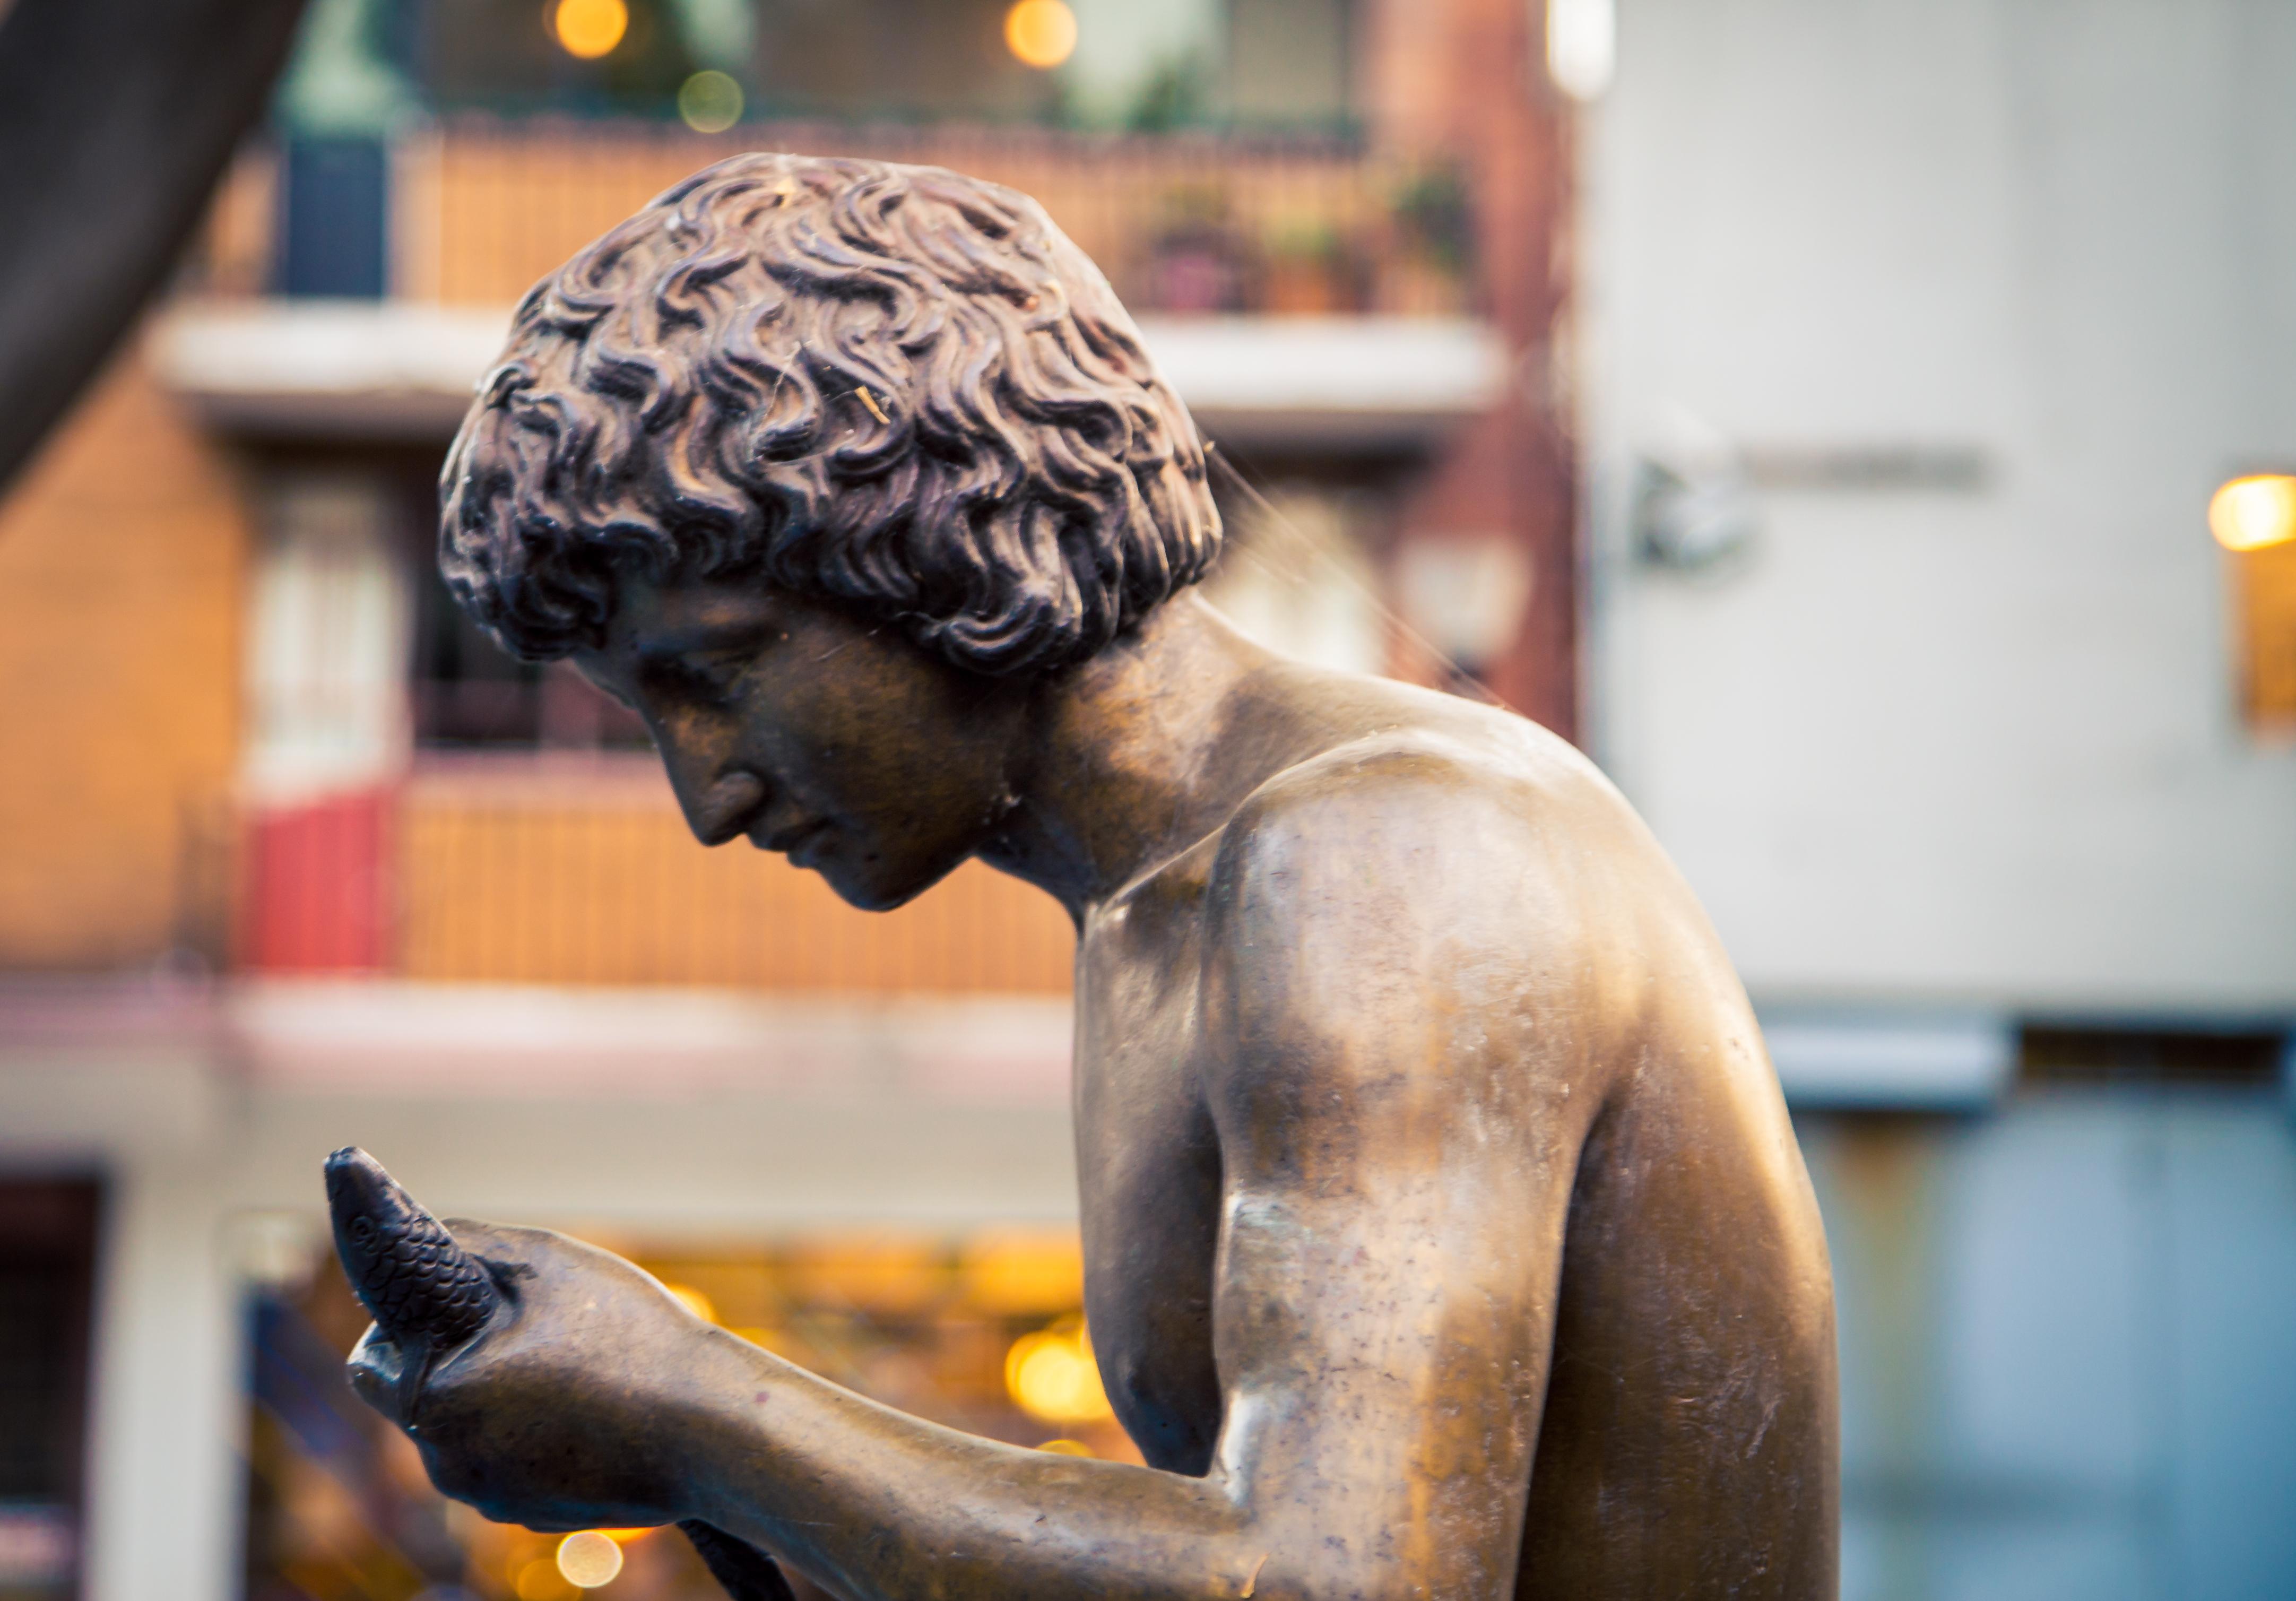 Statue of man cast in metal